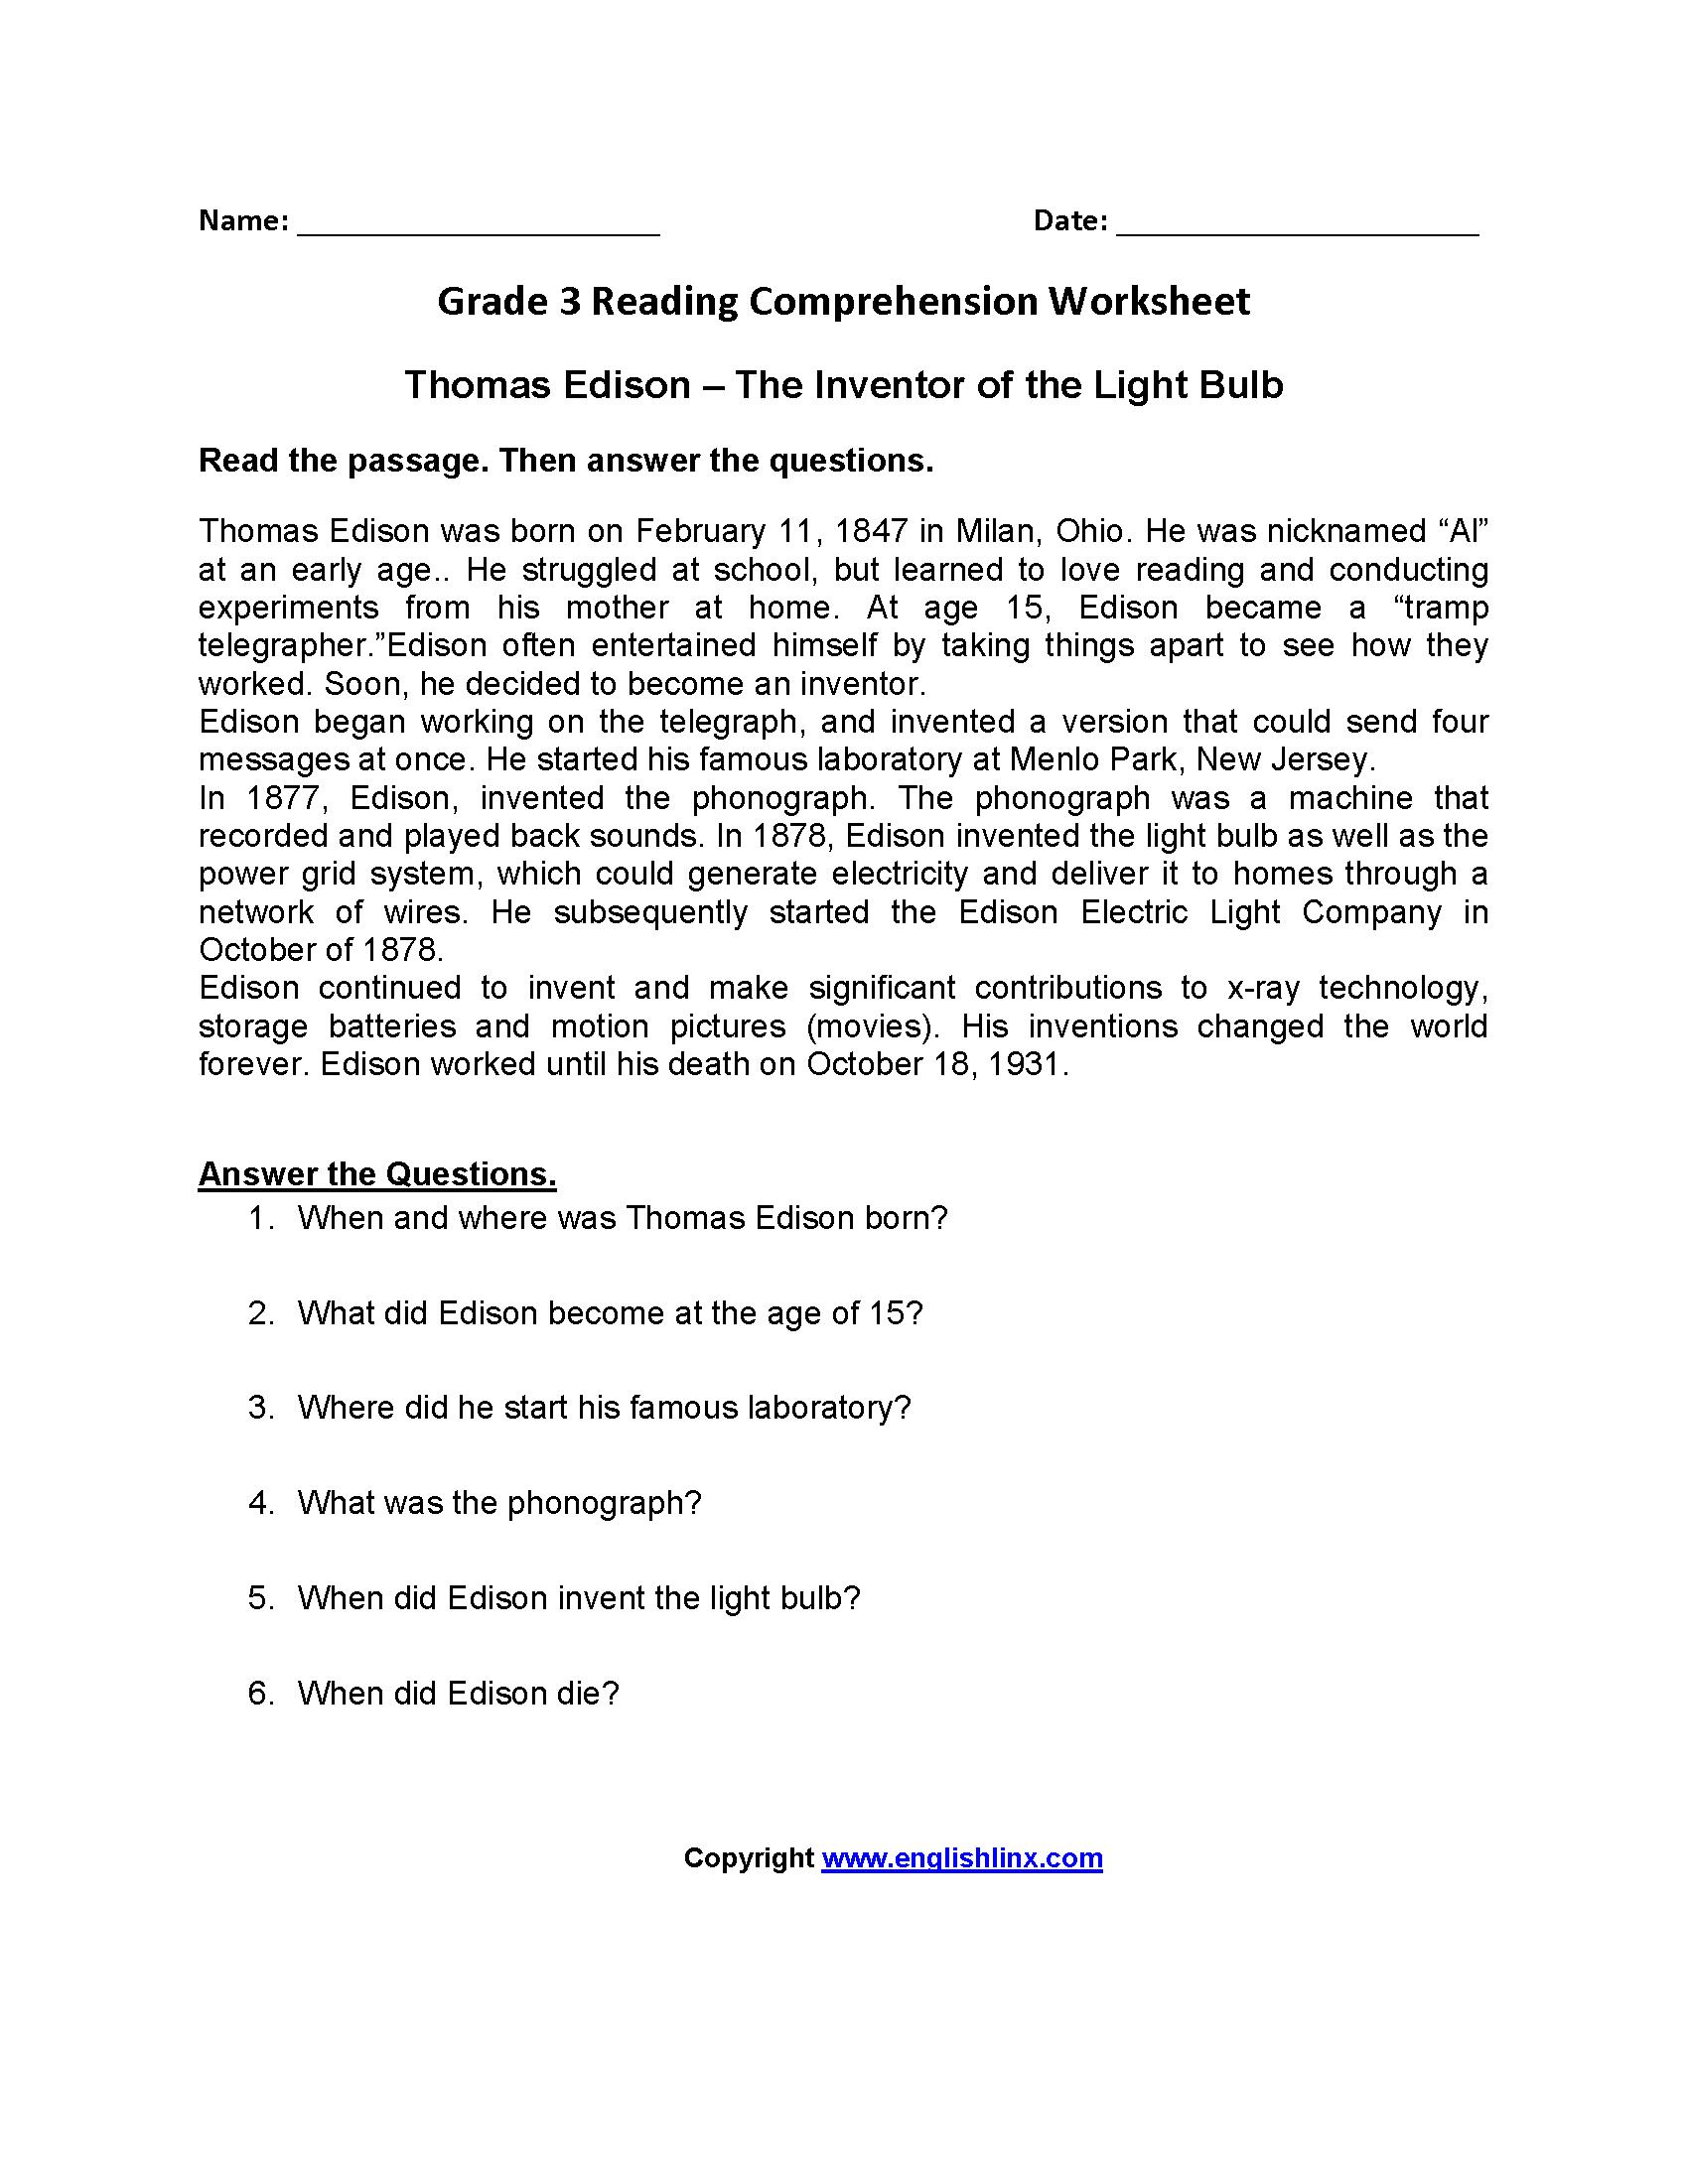 3Rd Grade Reading Worksheets Pdf — db excel.com